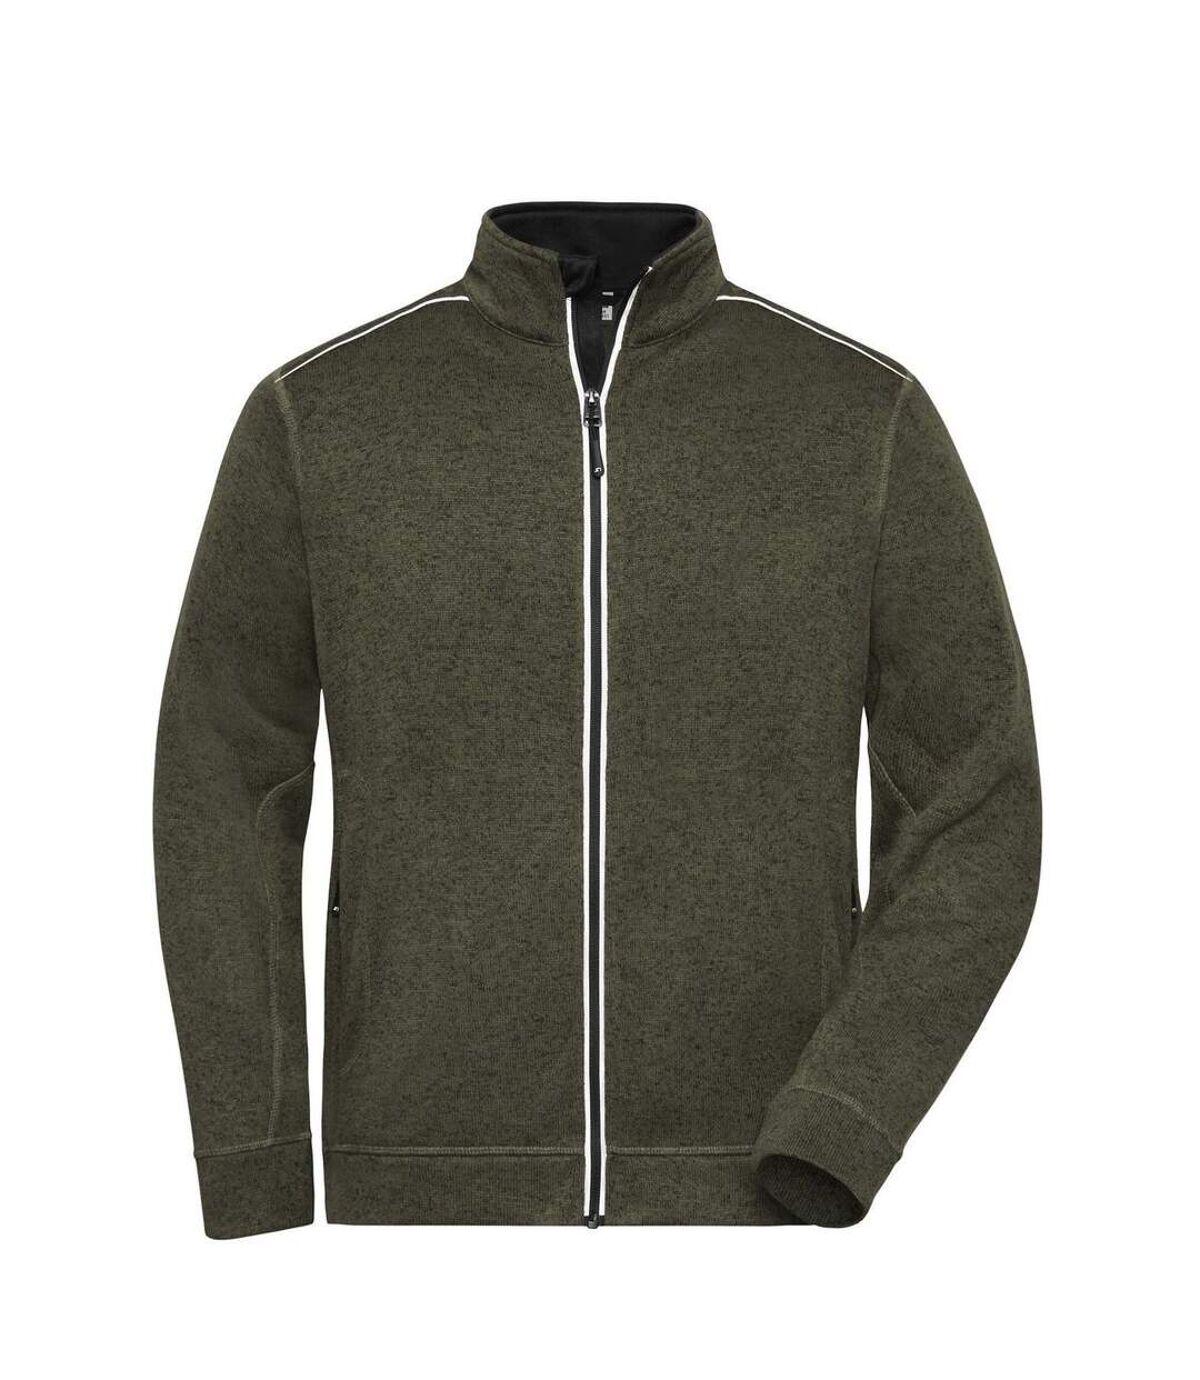 Veste zippée polaire workwear - homme - JN898 - vert olive